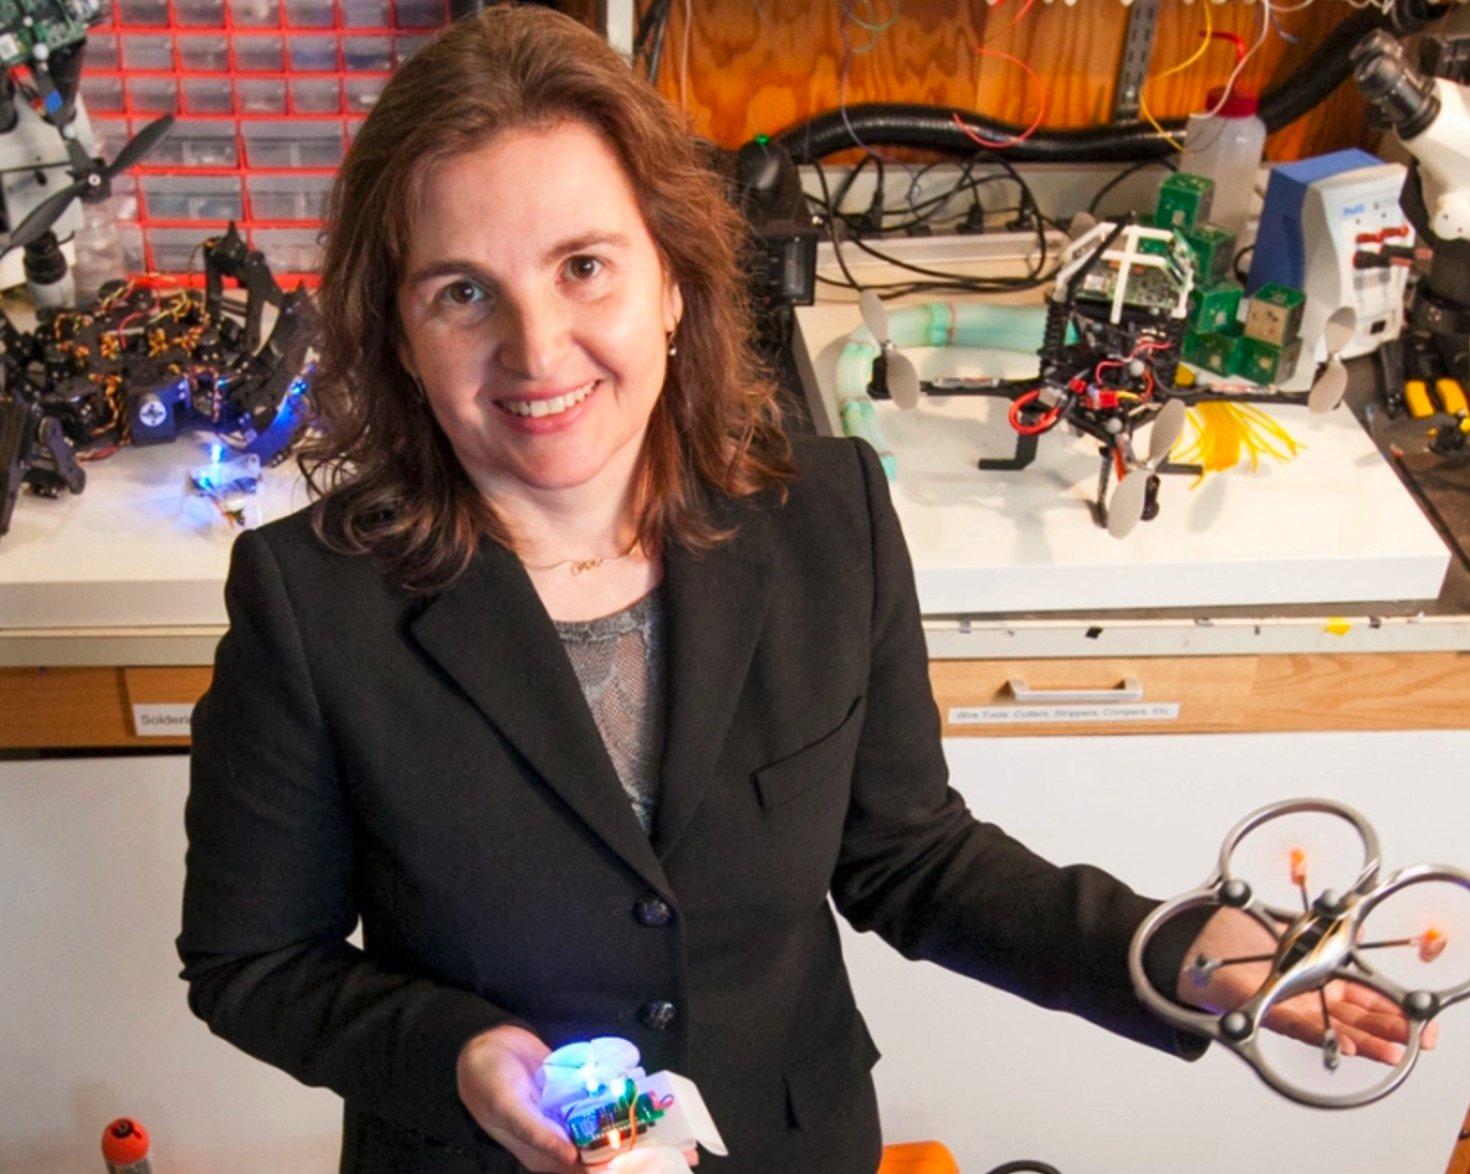 MIT's Daniela Rus is leading a robotics revolution https://t.co/x5ugIzWUHW https://t.co/yQyucebUmN